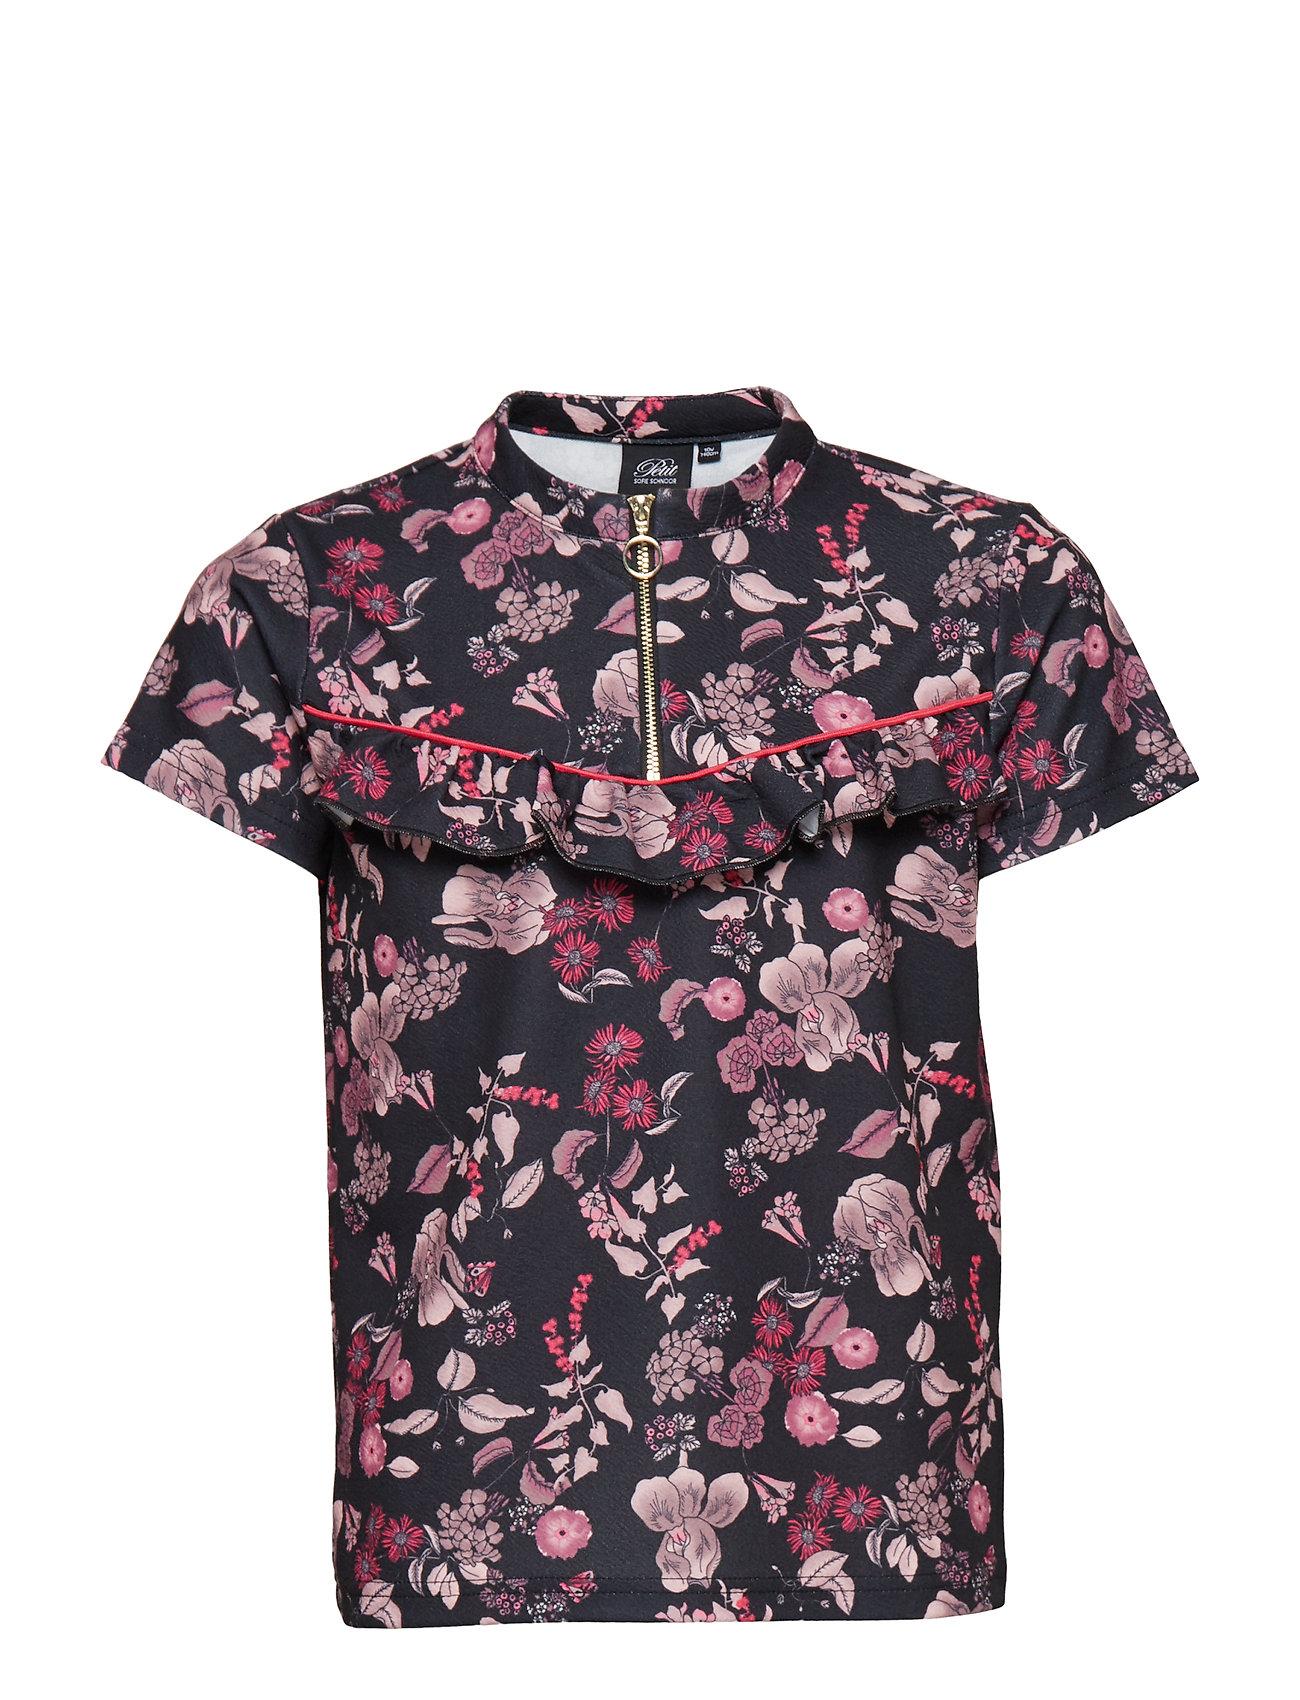 22f51cd77d7d Shirt Ss (Aop Black Print) (261.75 kr) - Petit by Sofie Schnoor ...